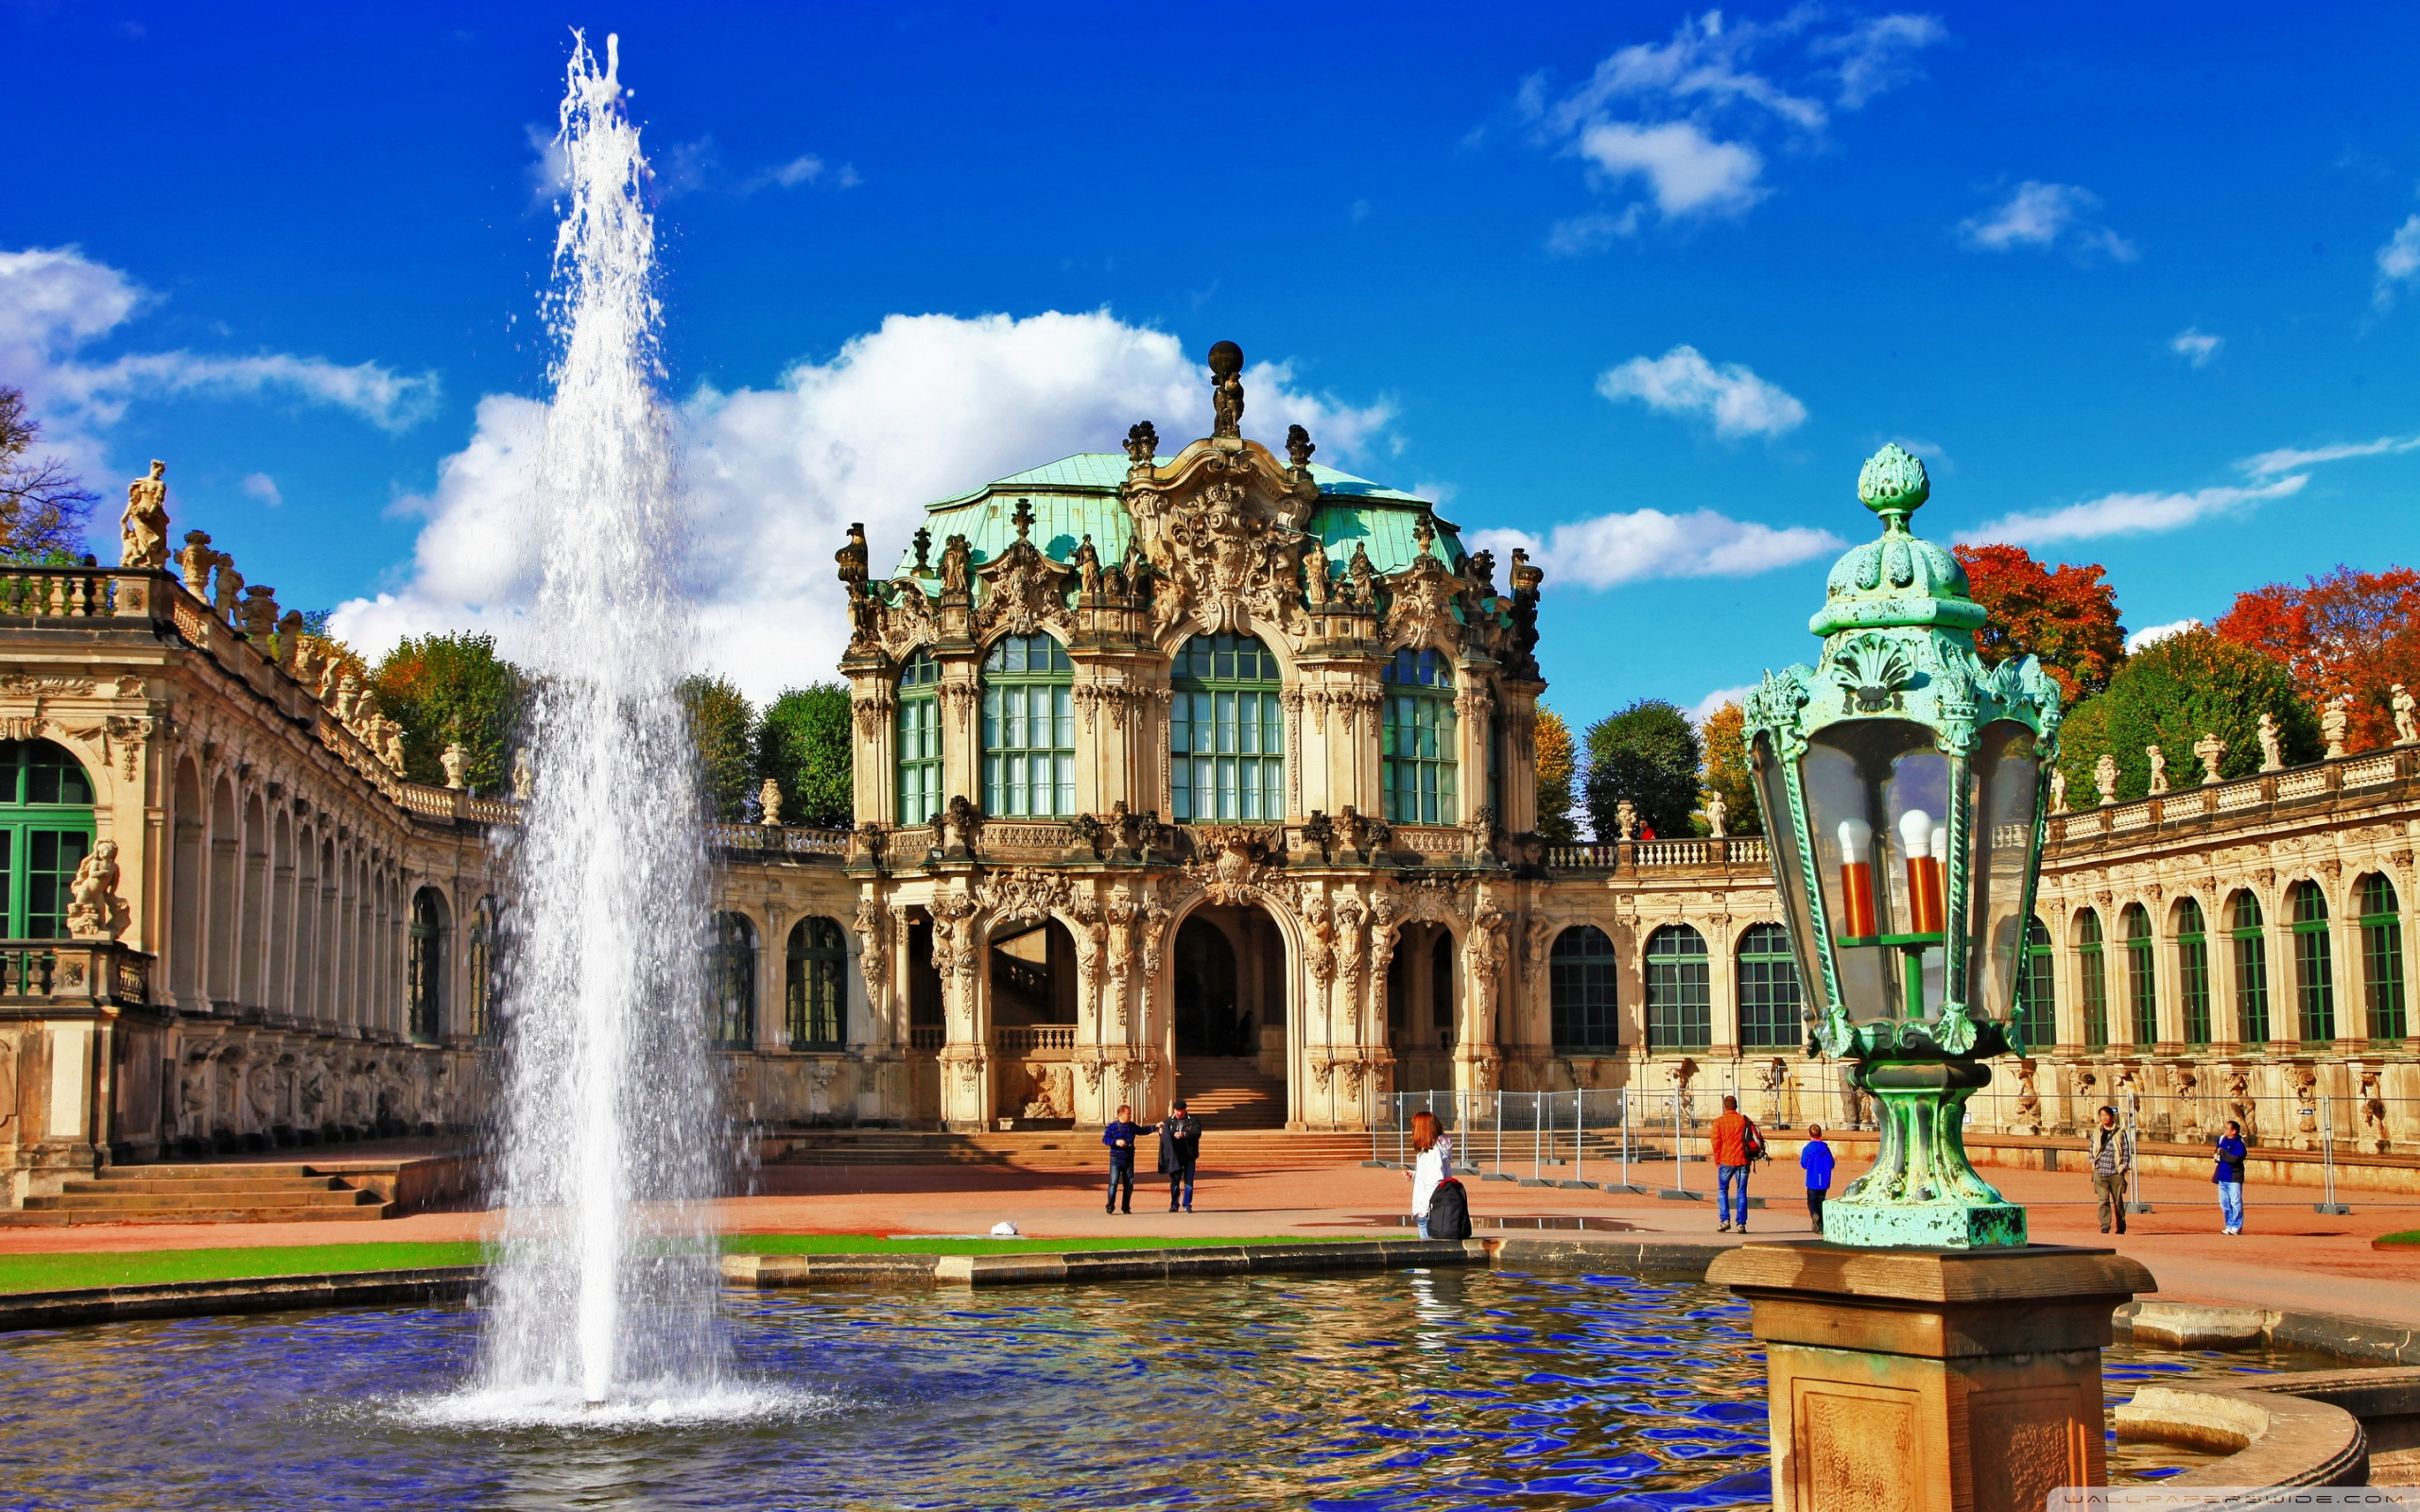 Zwinger Dresden Wallpaper 2   2560 X 1600 stmednet 2560x1600